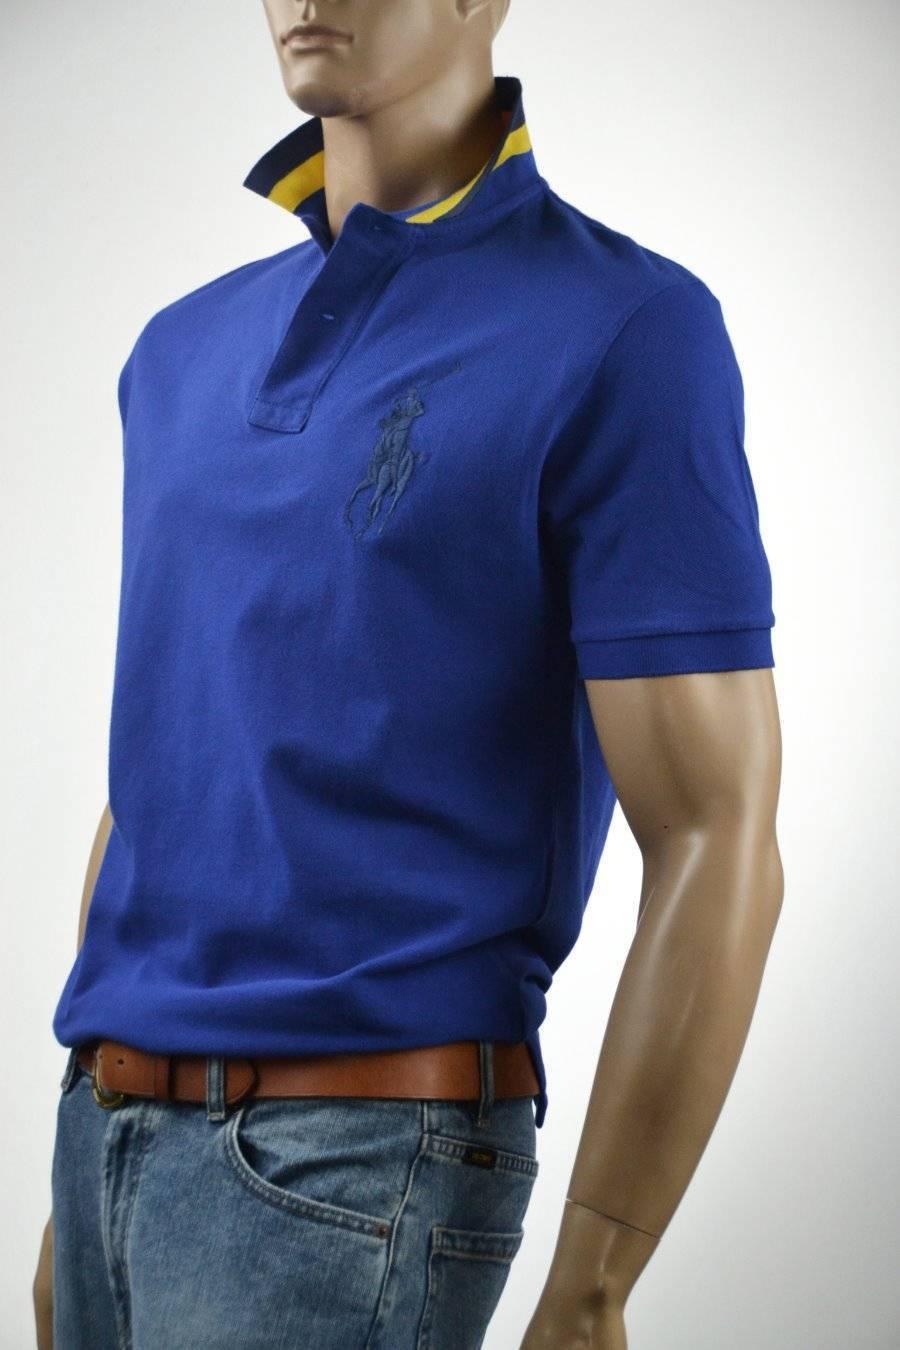 Ralph Lauren Royal bluee Mesh Polo Shirt Big Navy bluee Pony-Medium- NWT